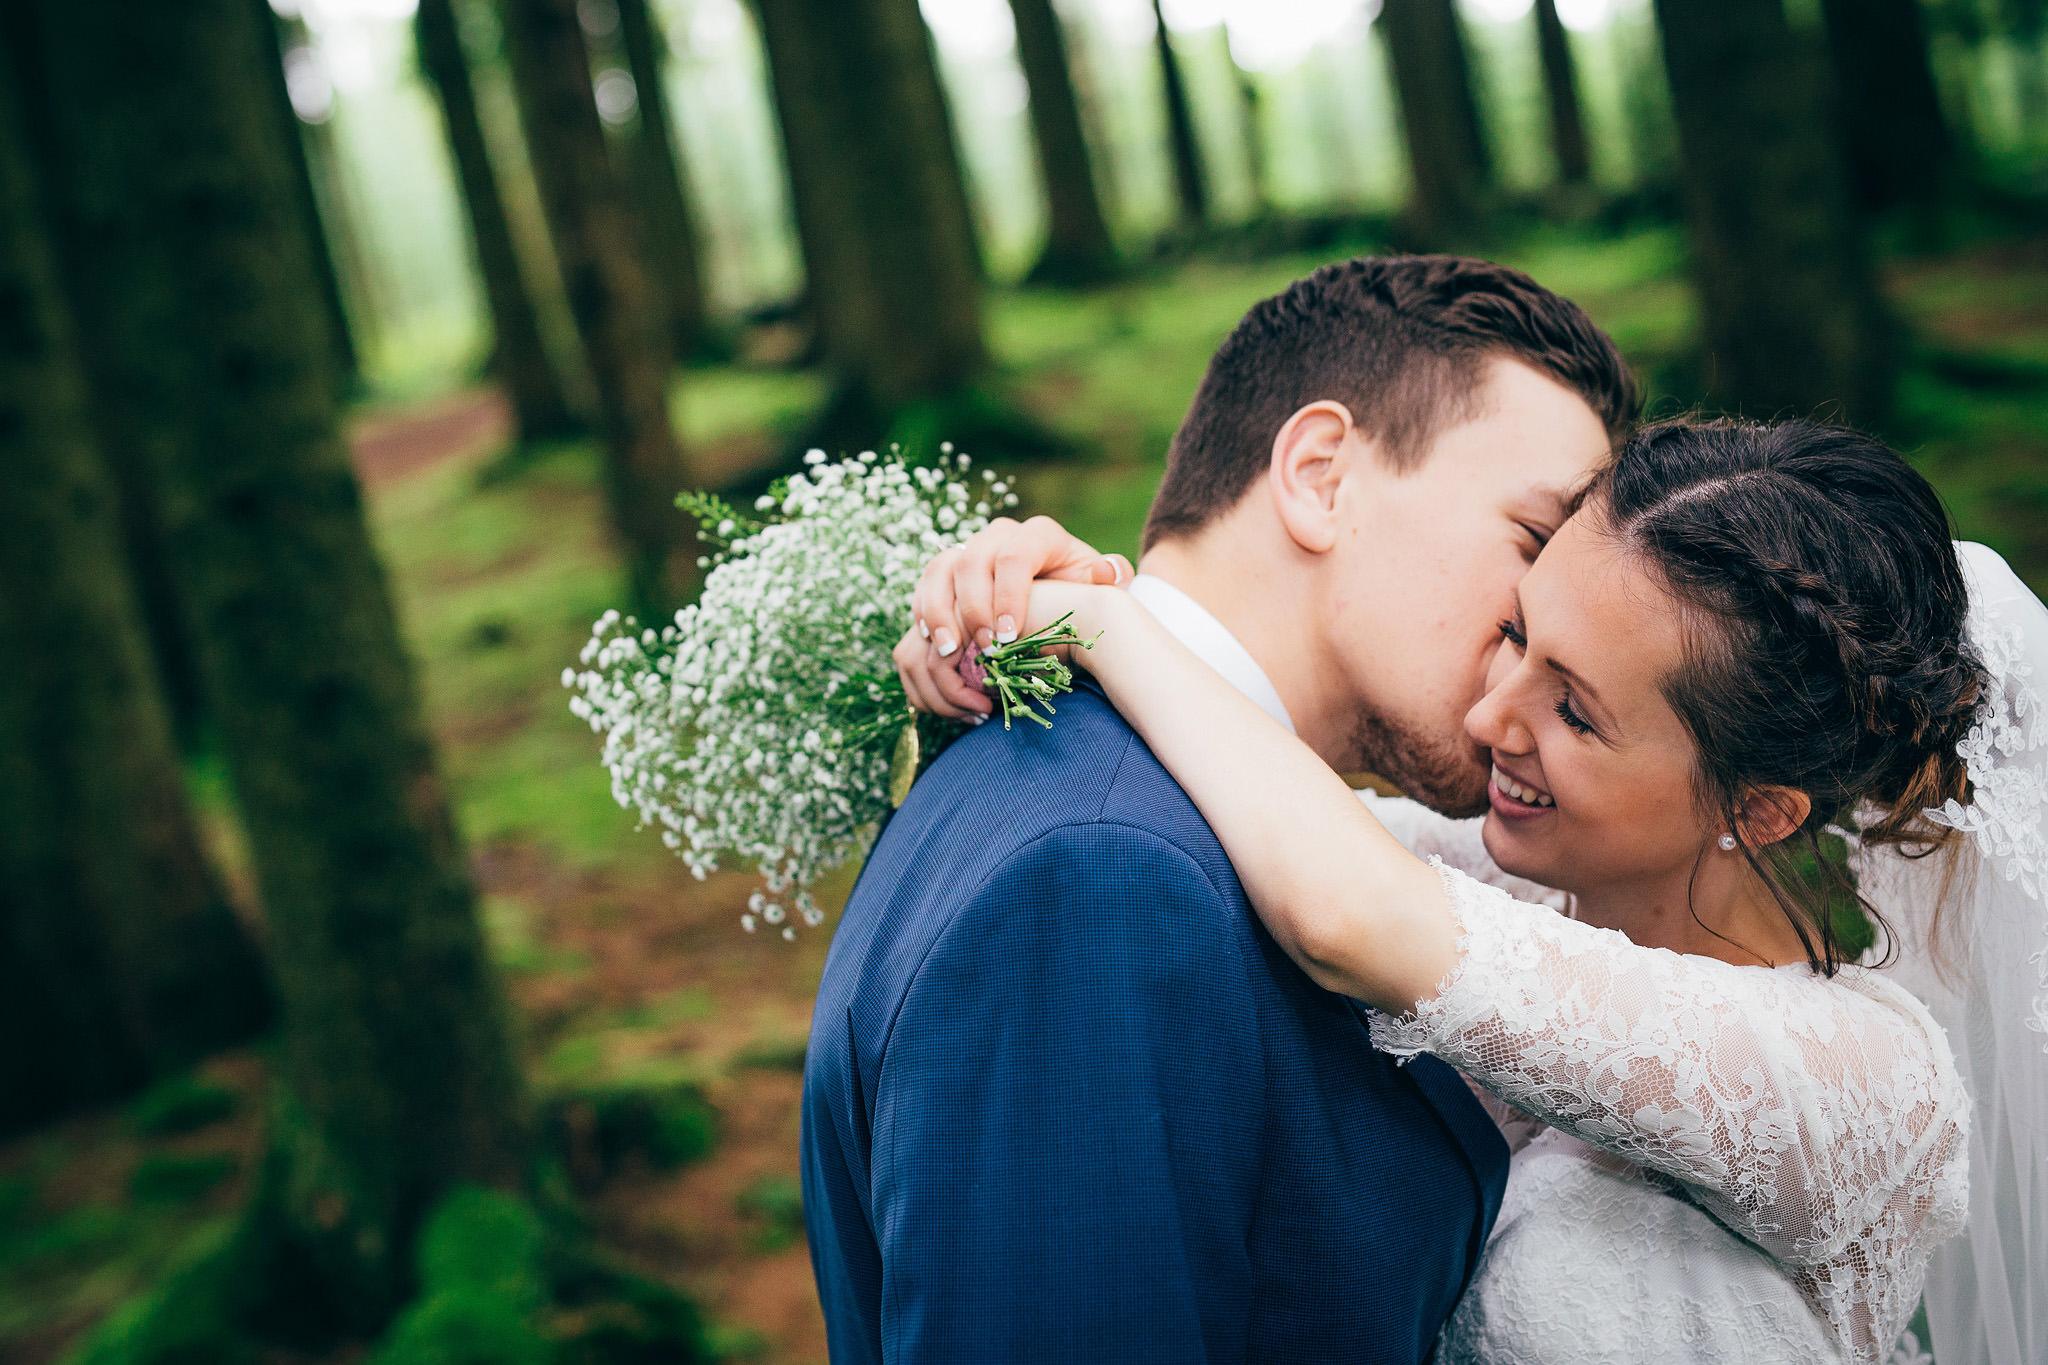 Norway+wedding+photographer+elopement+pre+wedding+Rogaland+bryllupsfotograf+Casey+Arneson-130.jpg